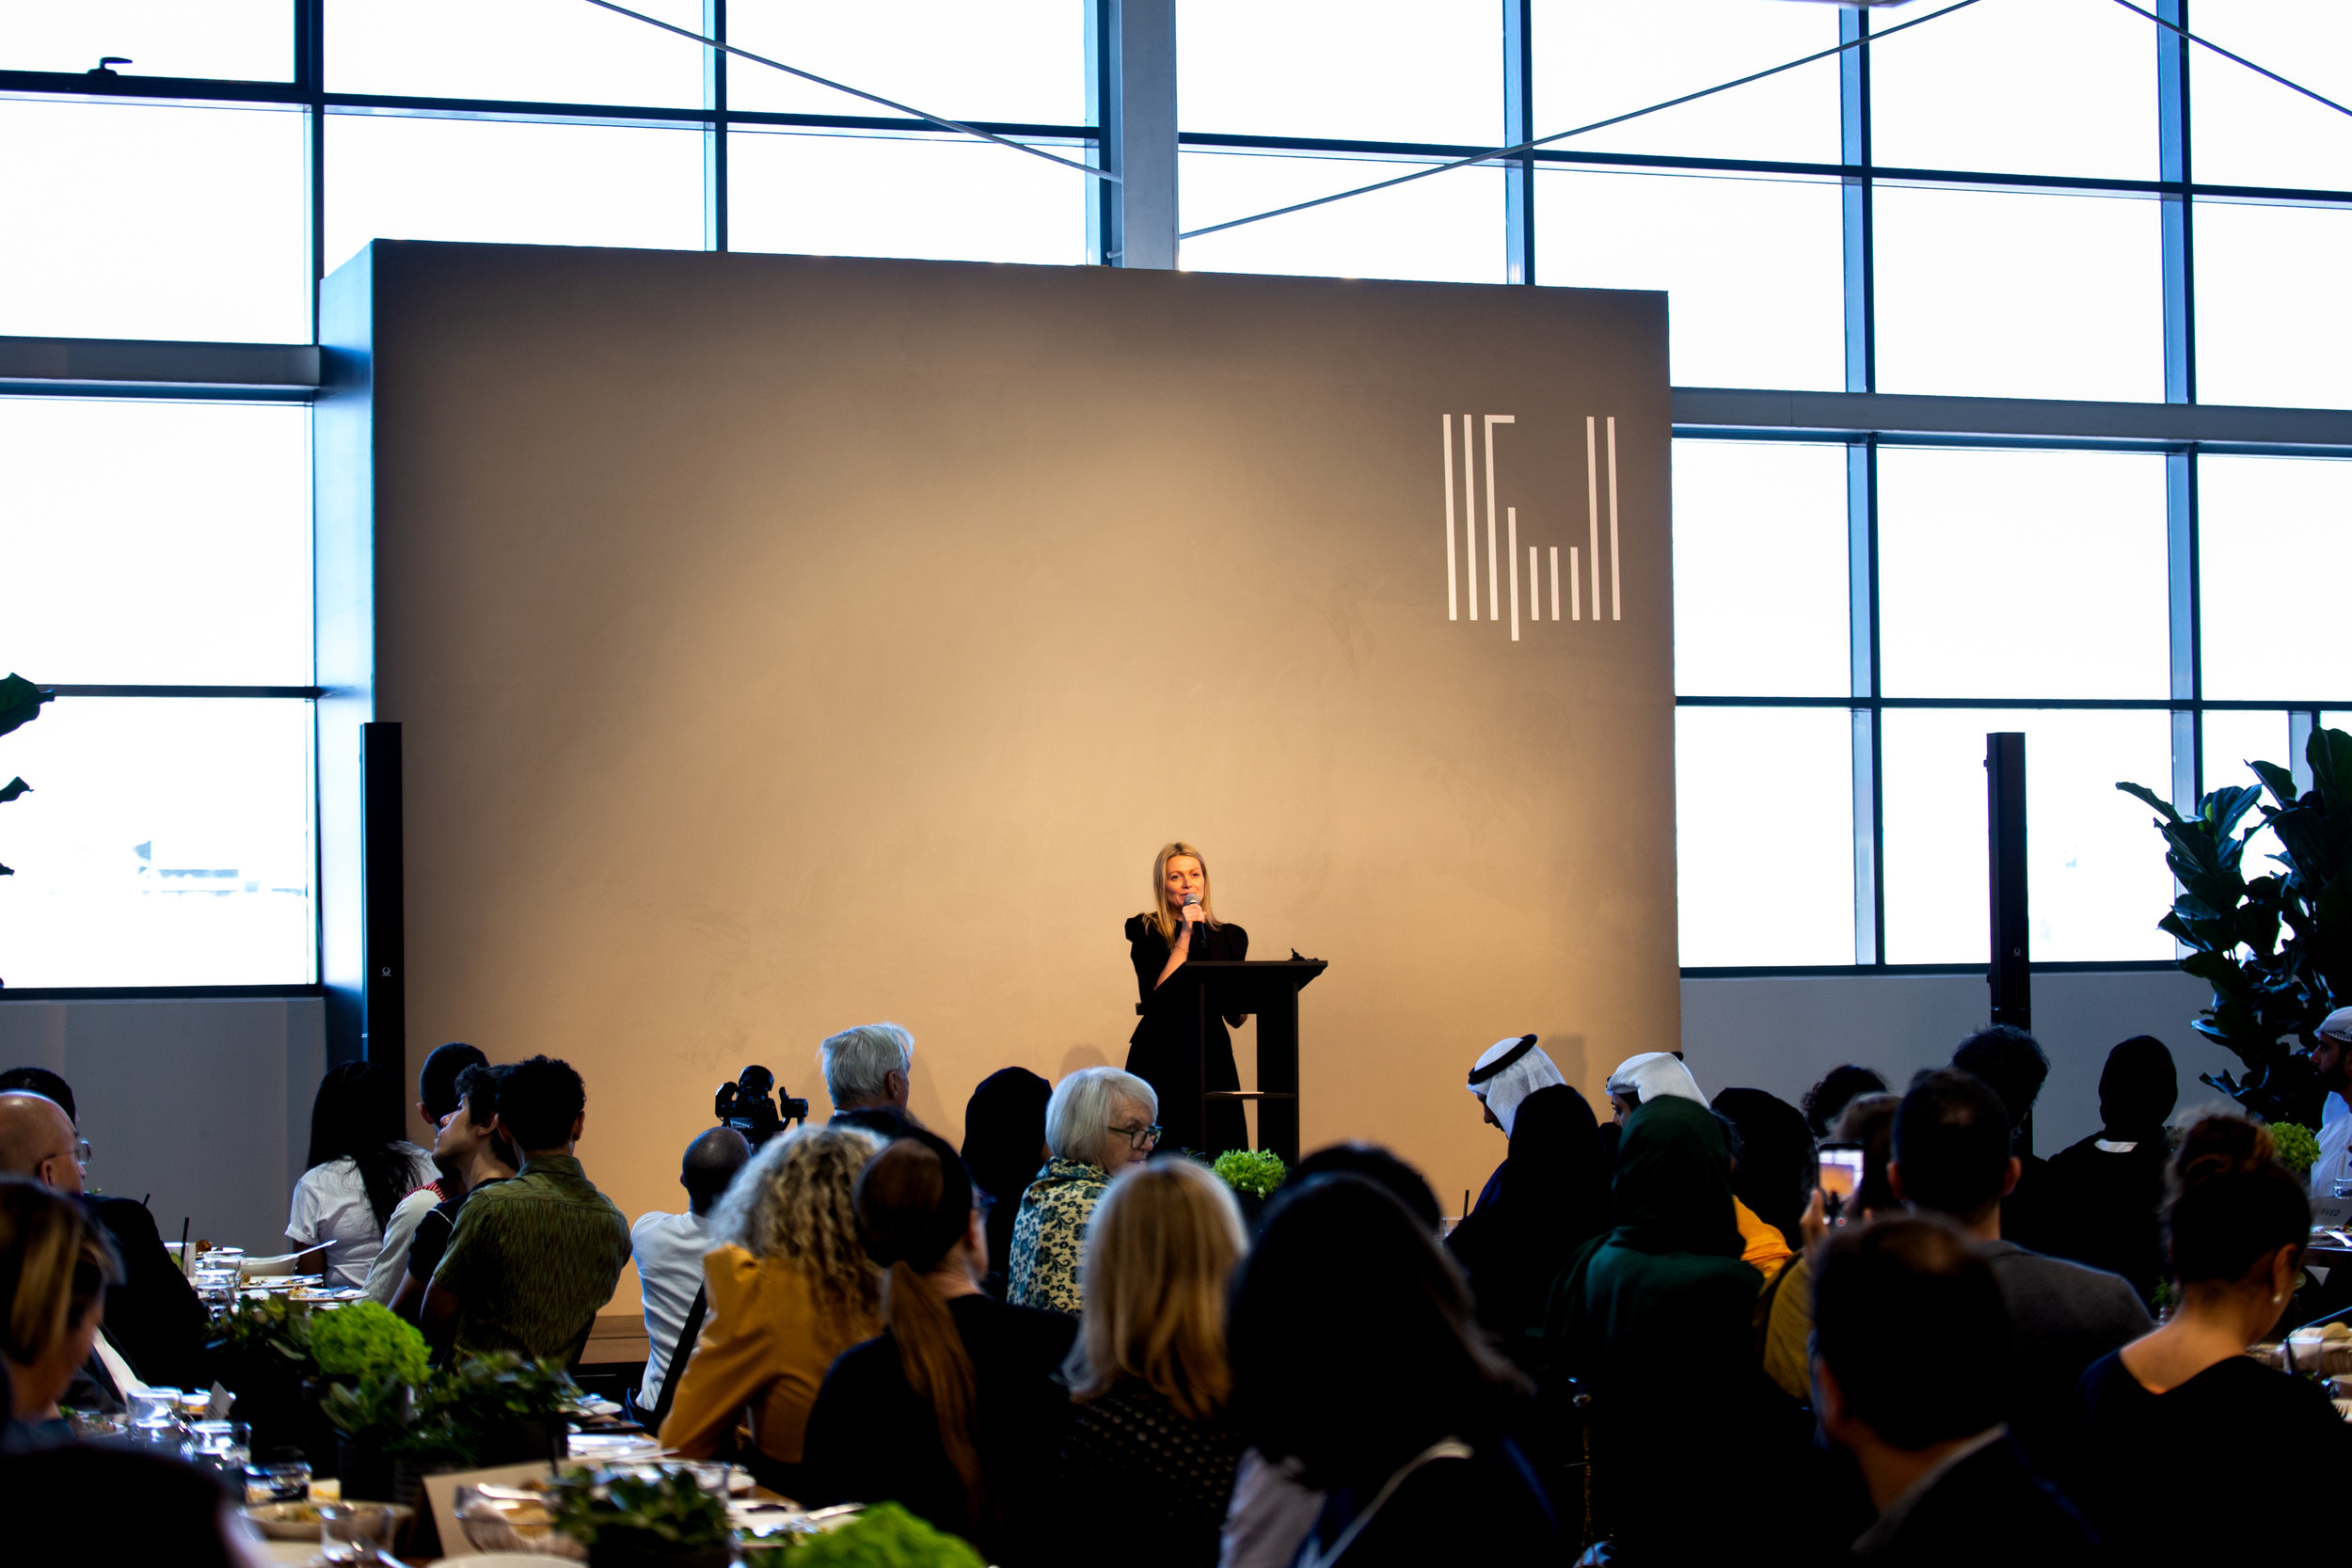 Vilma Jurkute at the Alserkal Arts Foundation announcement. Photo credit Tara Atkinson.